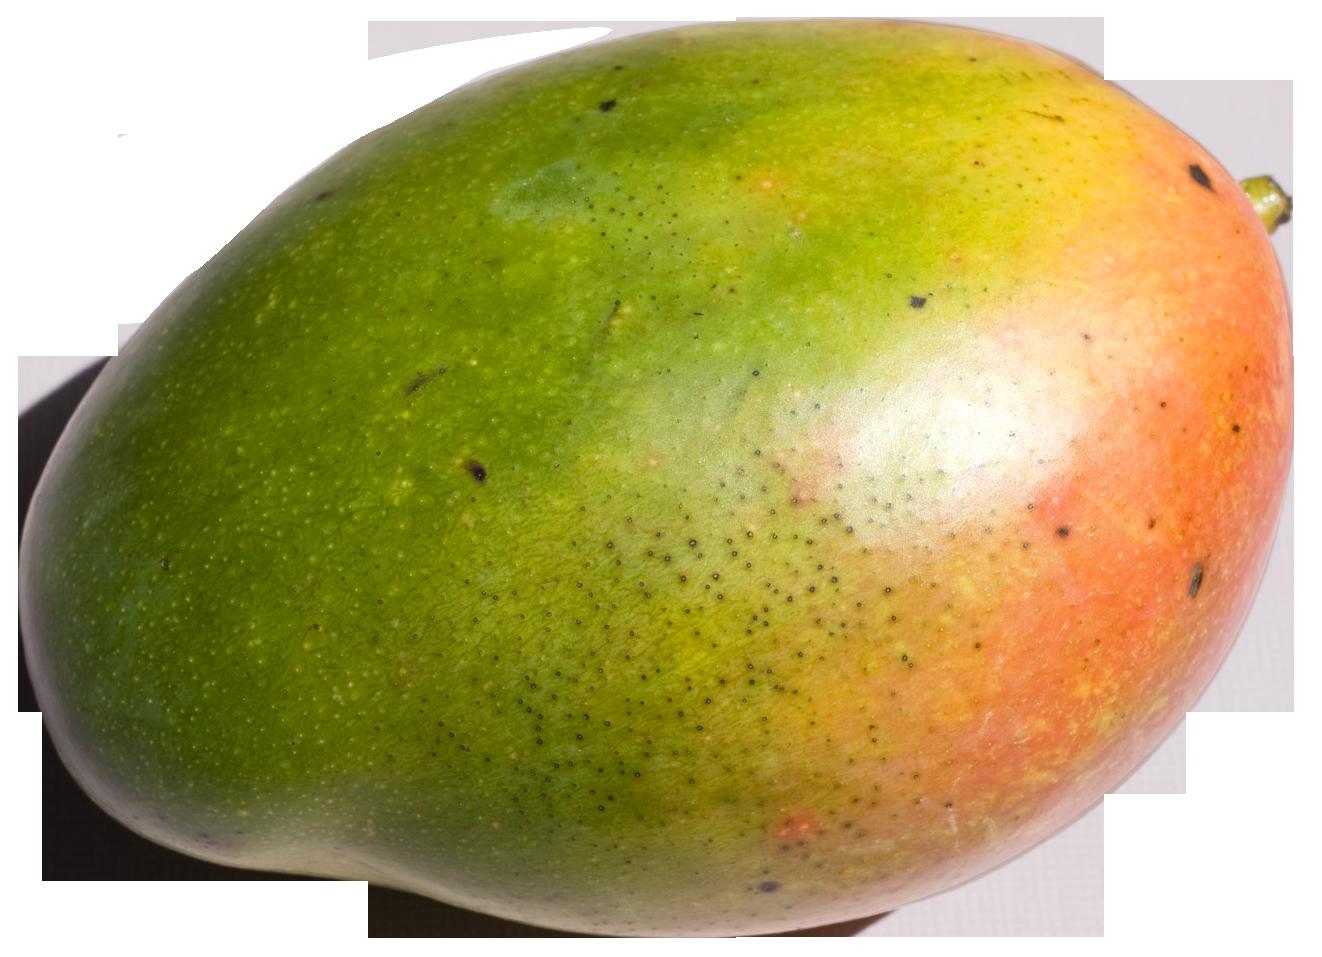 Delicious Mango PNG image - Mango PNG - Mango HD PNG